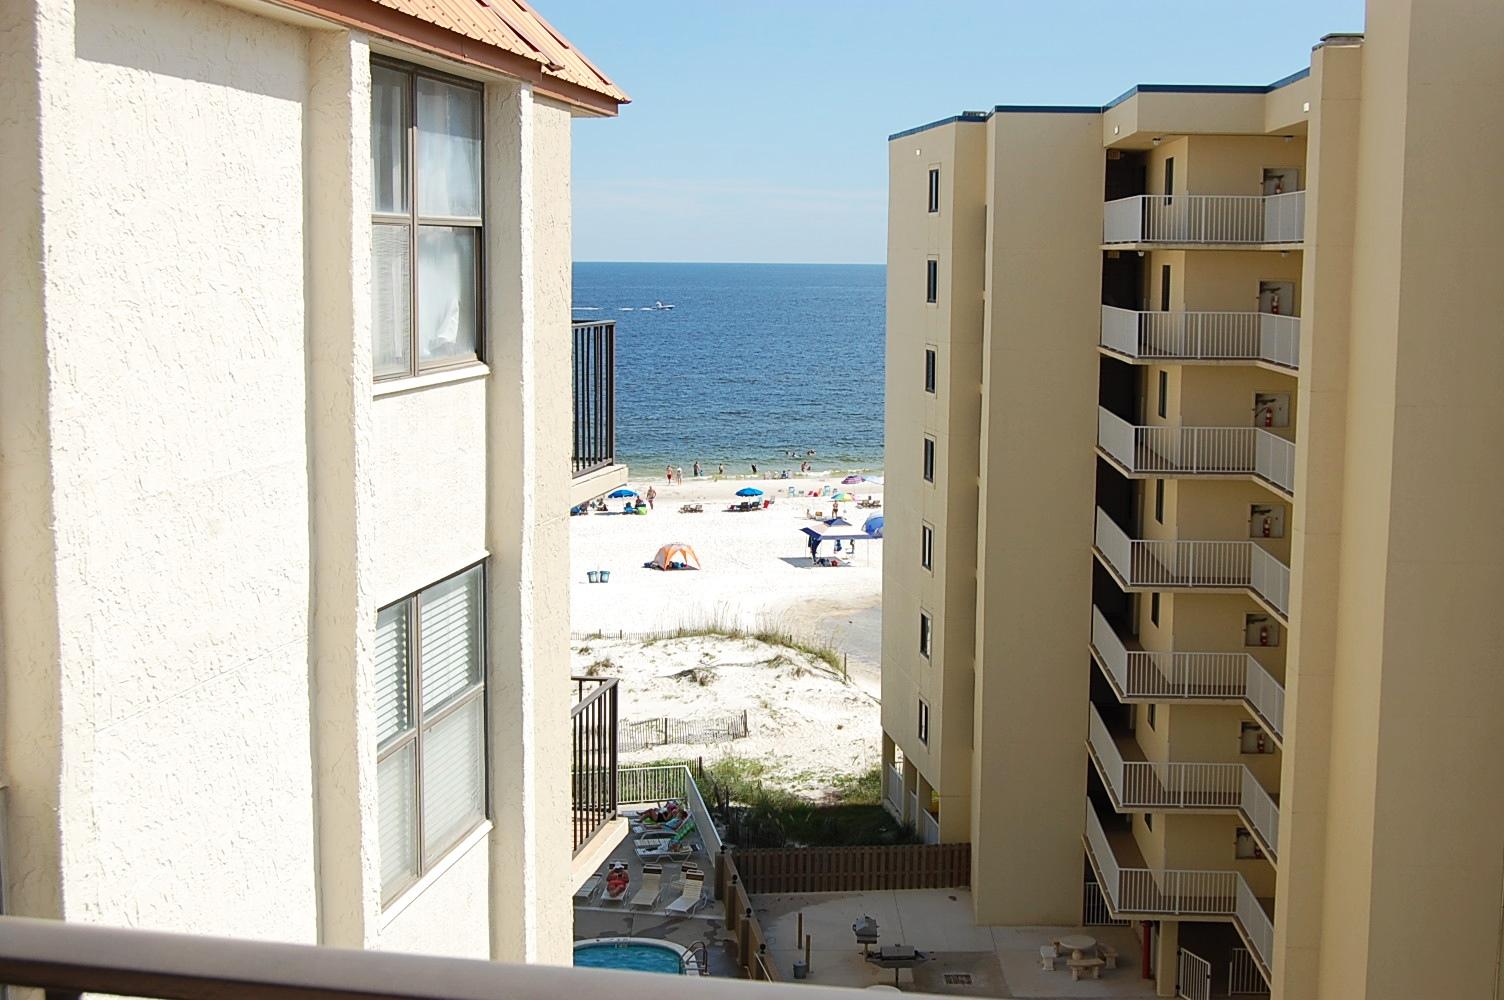 Gulf House 606 Condo rental in Gulf House Condominiums in Gulf Shores Alabama - #11